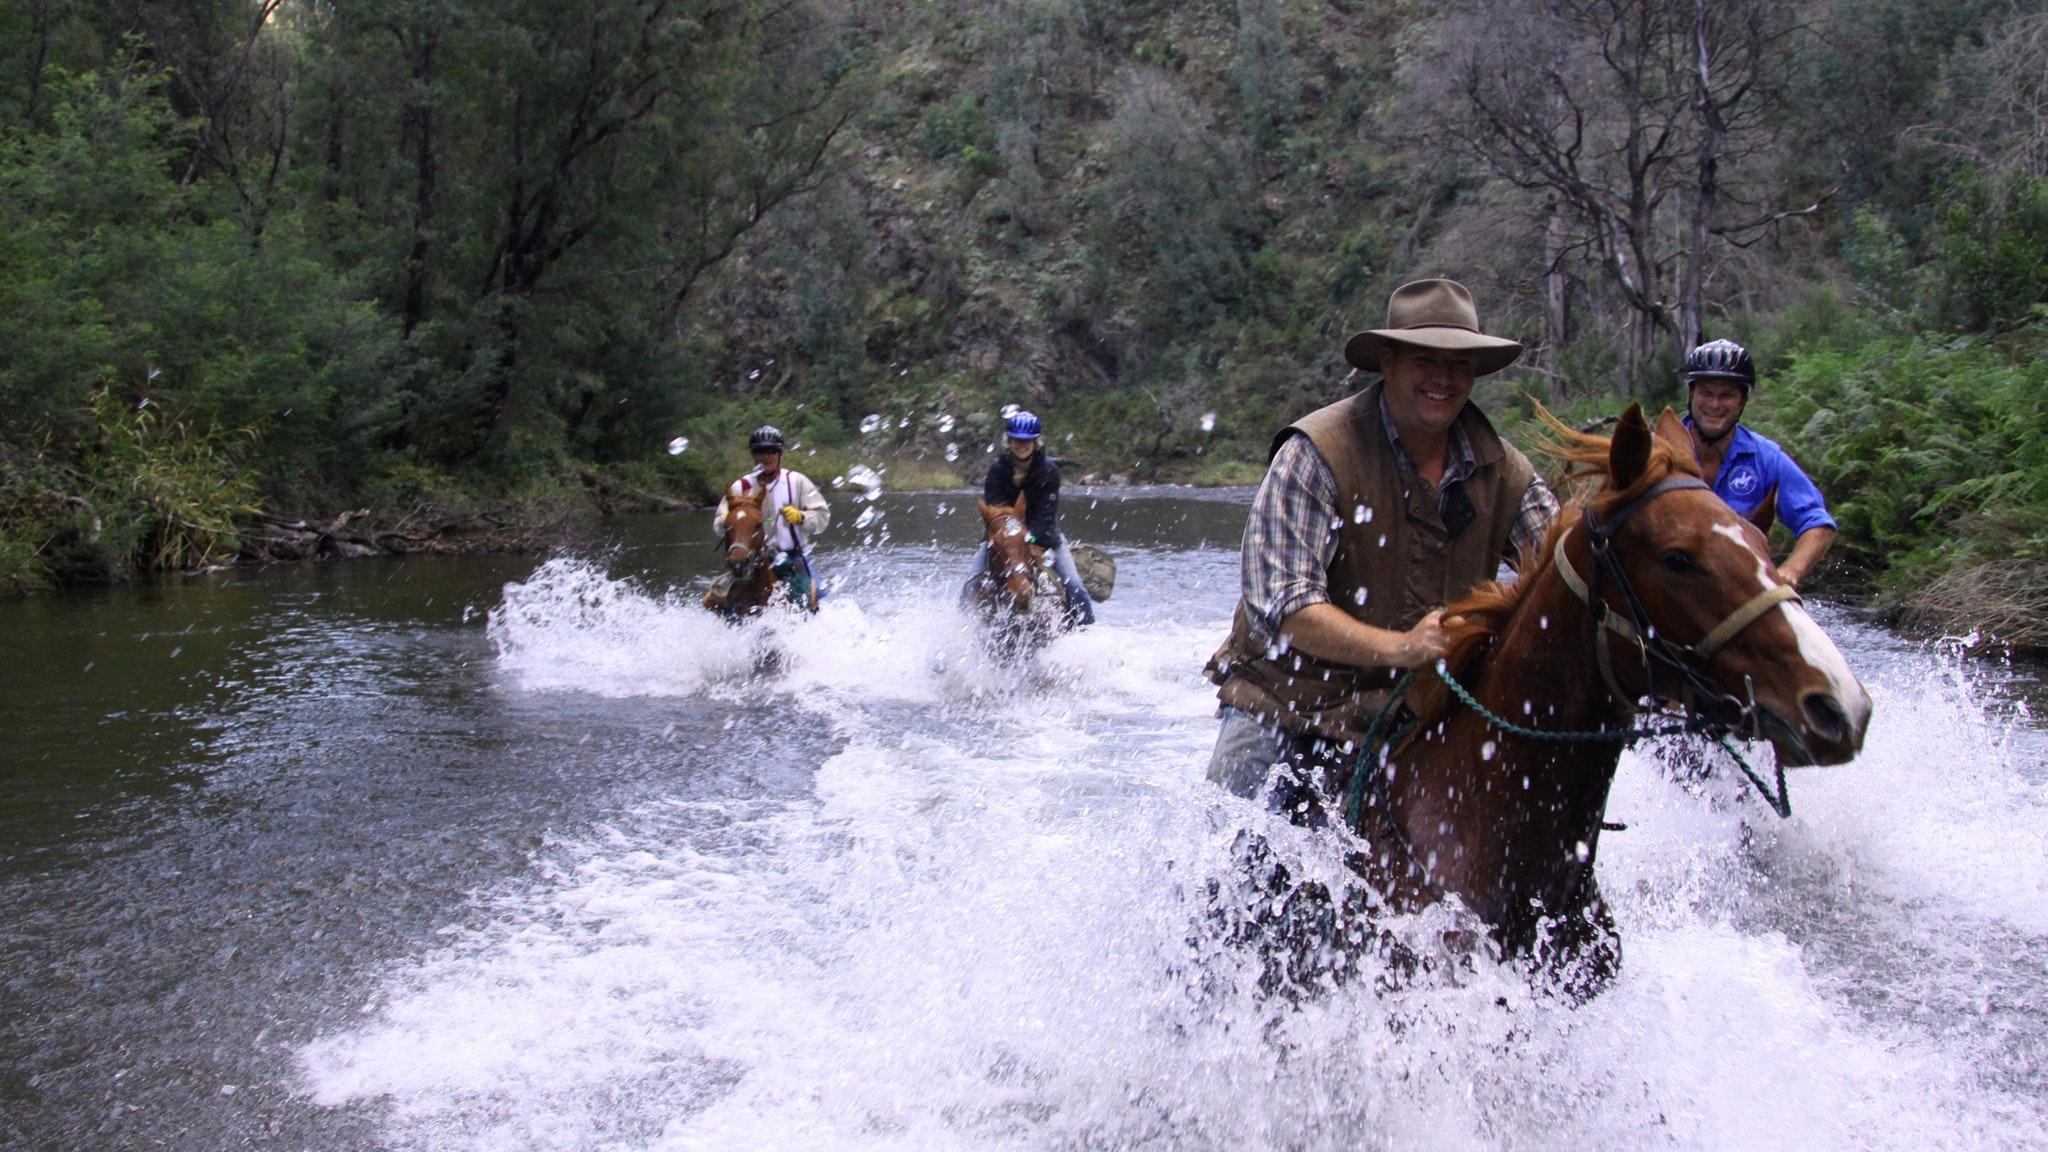 Horse riding along the Howqua River